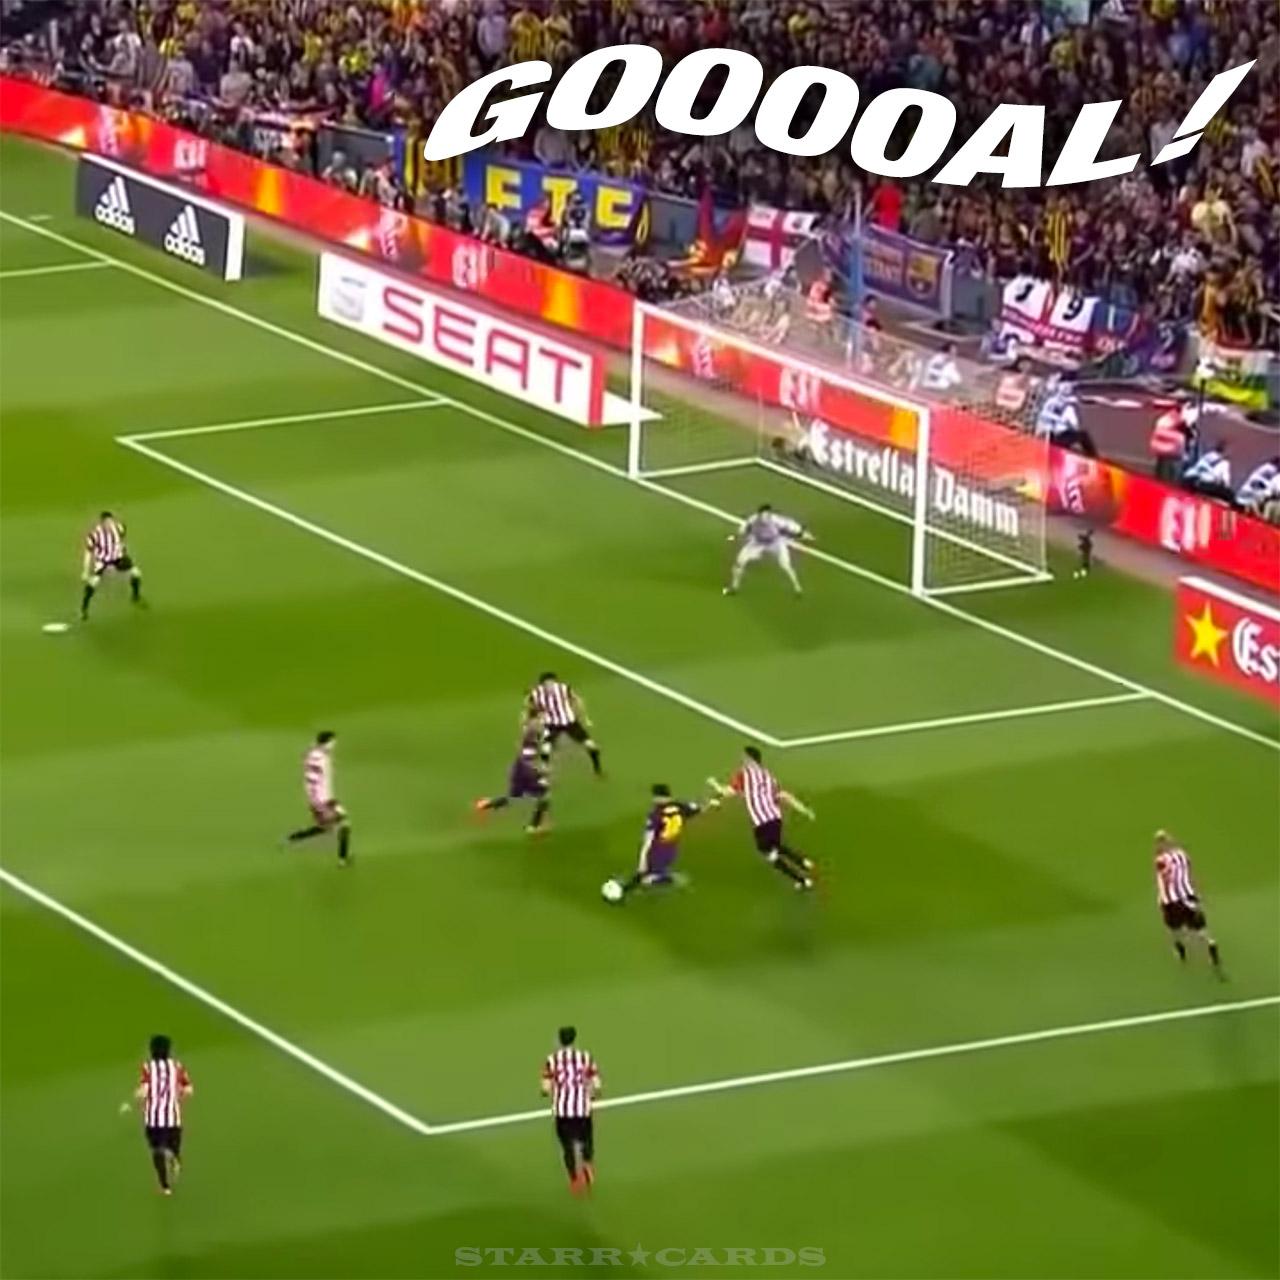 Lionel Messi goal versus Athletic Bilbao in Copa Del Rey nominated for Puskás Award